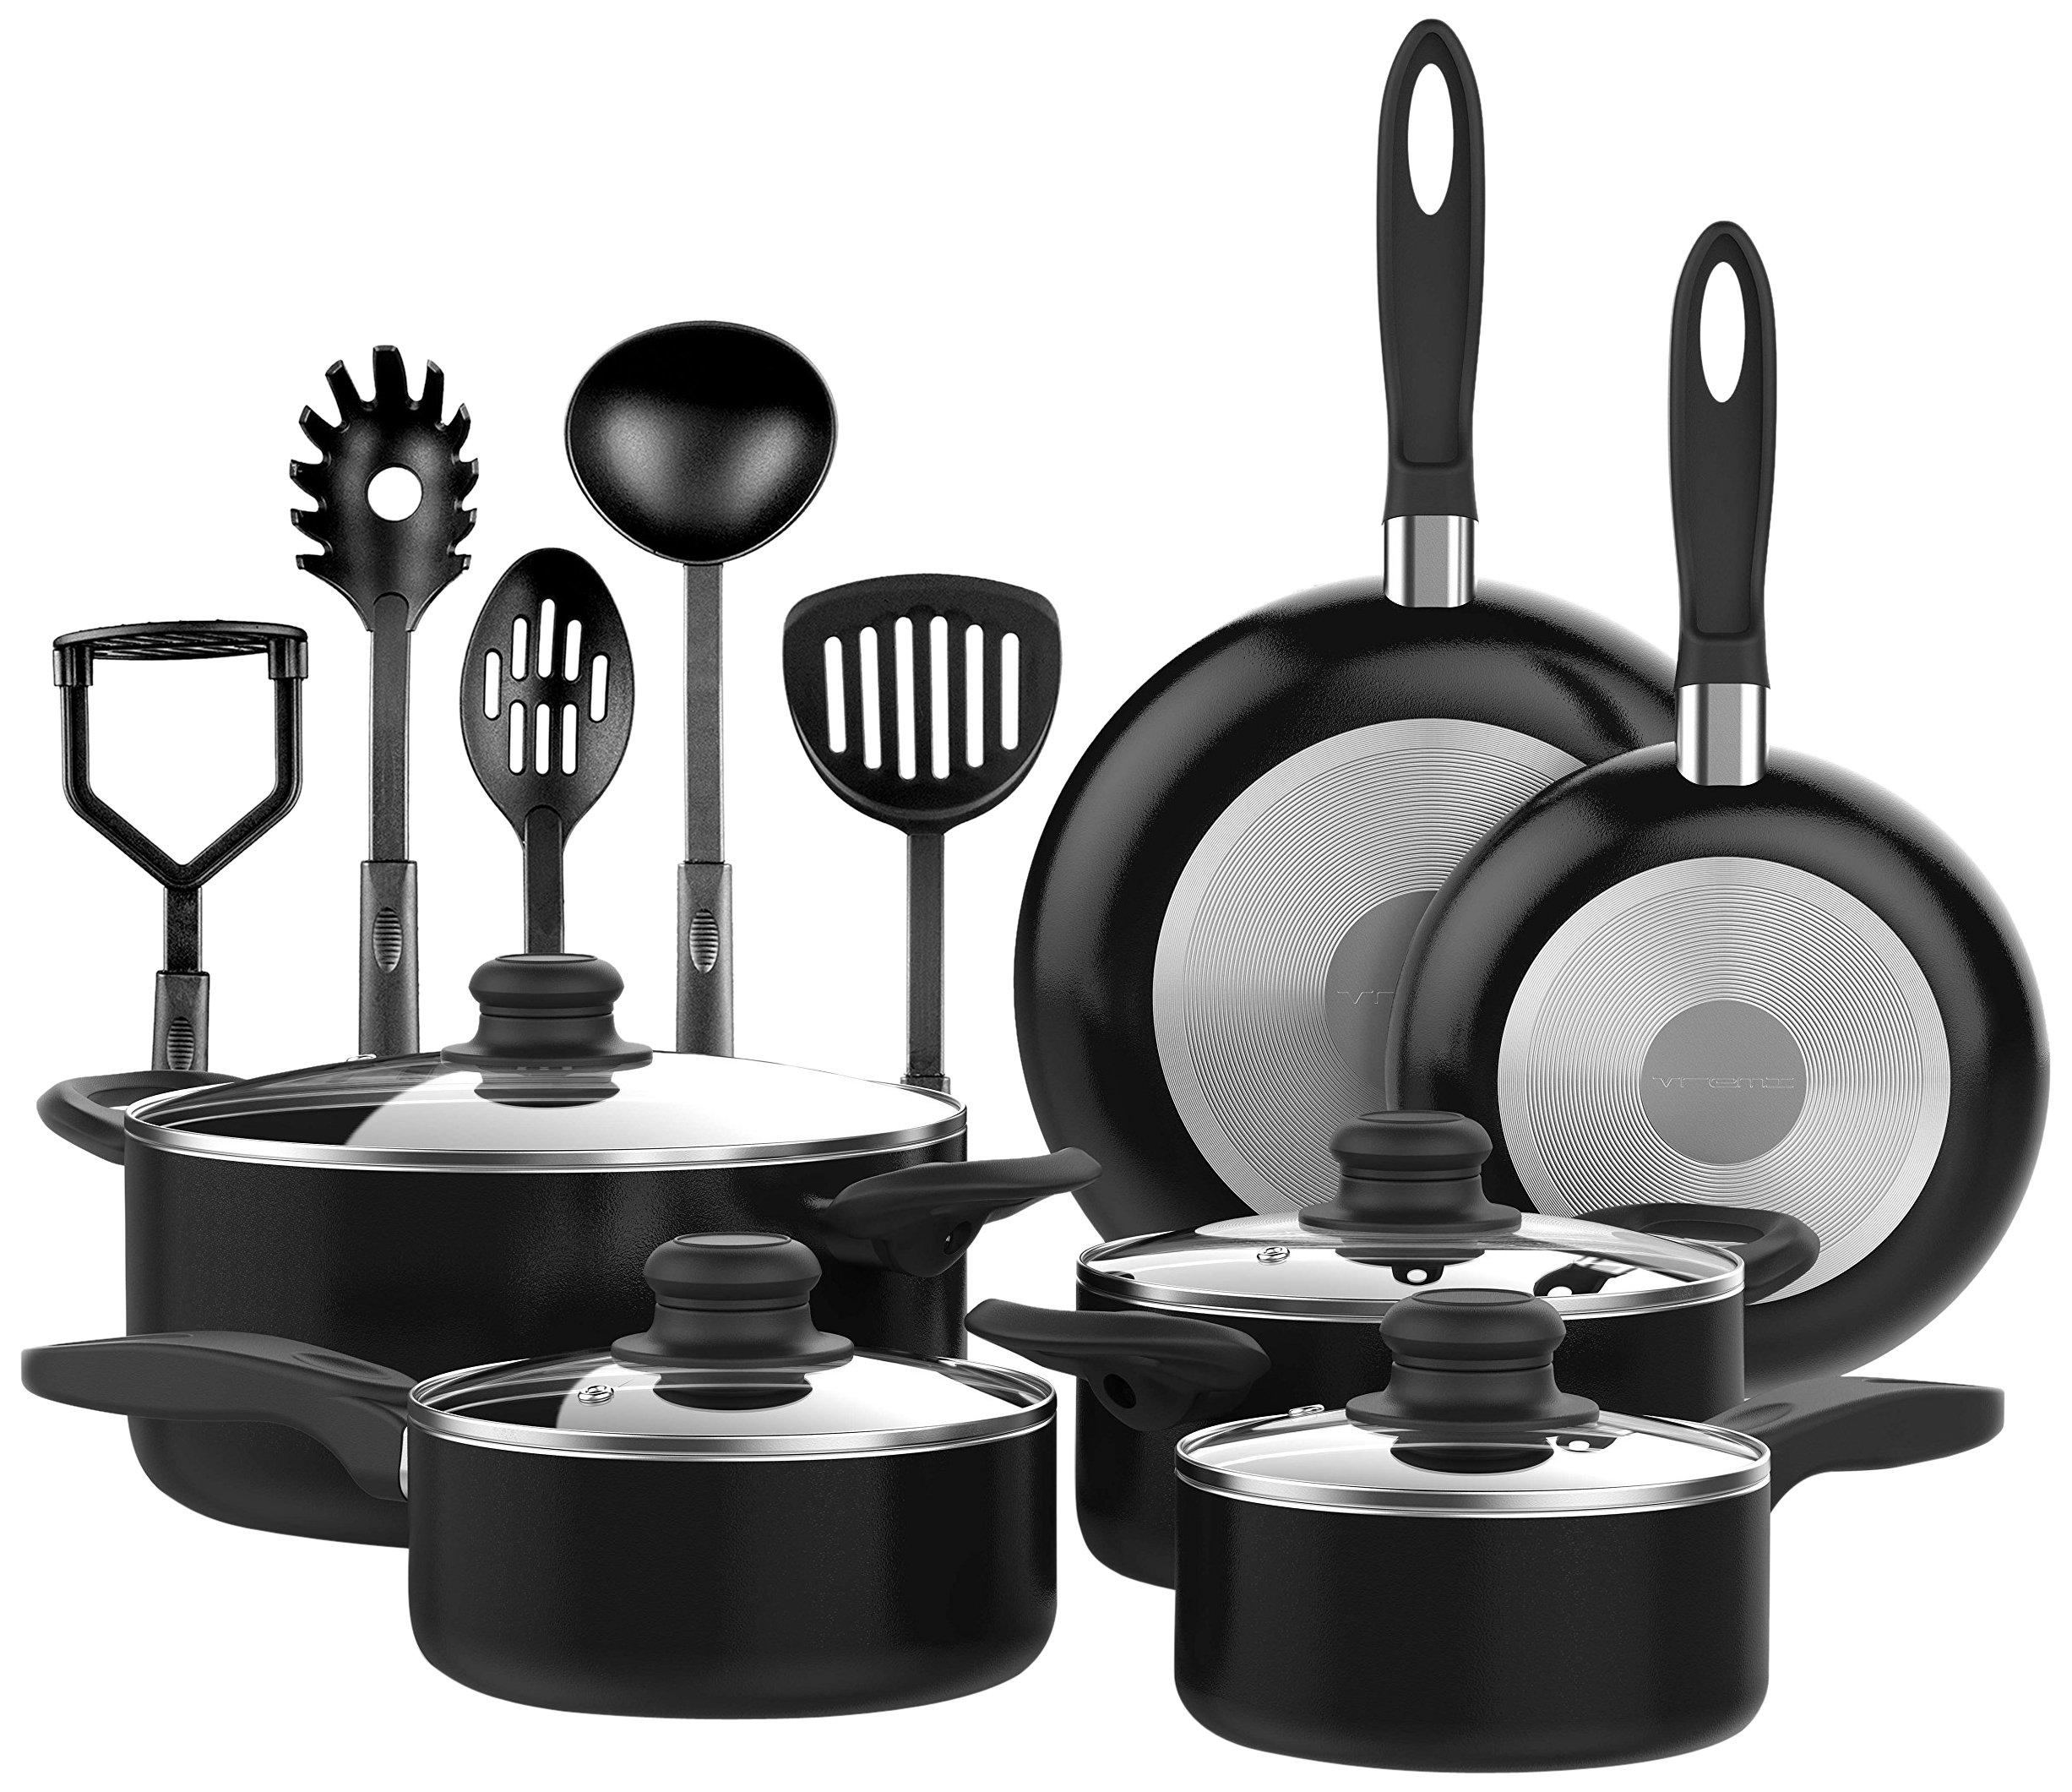 Vremi 15 Piece Nonstick Cookware Set; Includes 4 Pots With 4 Lids 2 Pans And .. 16